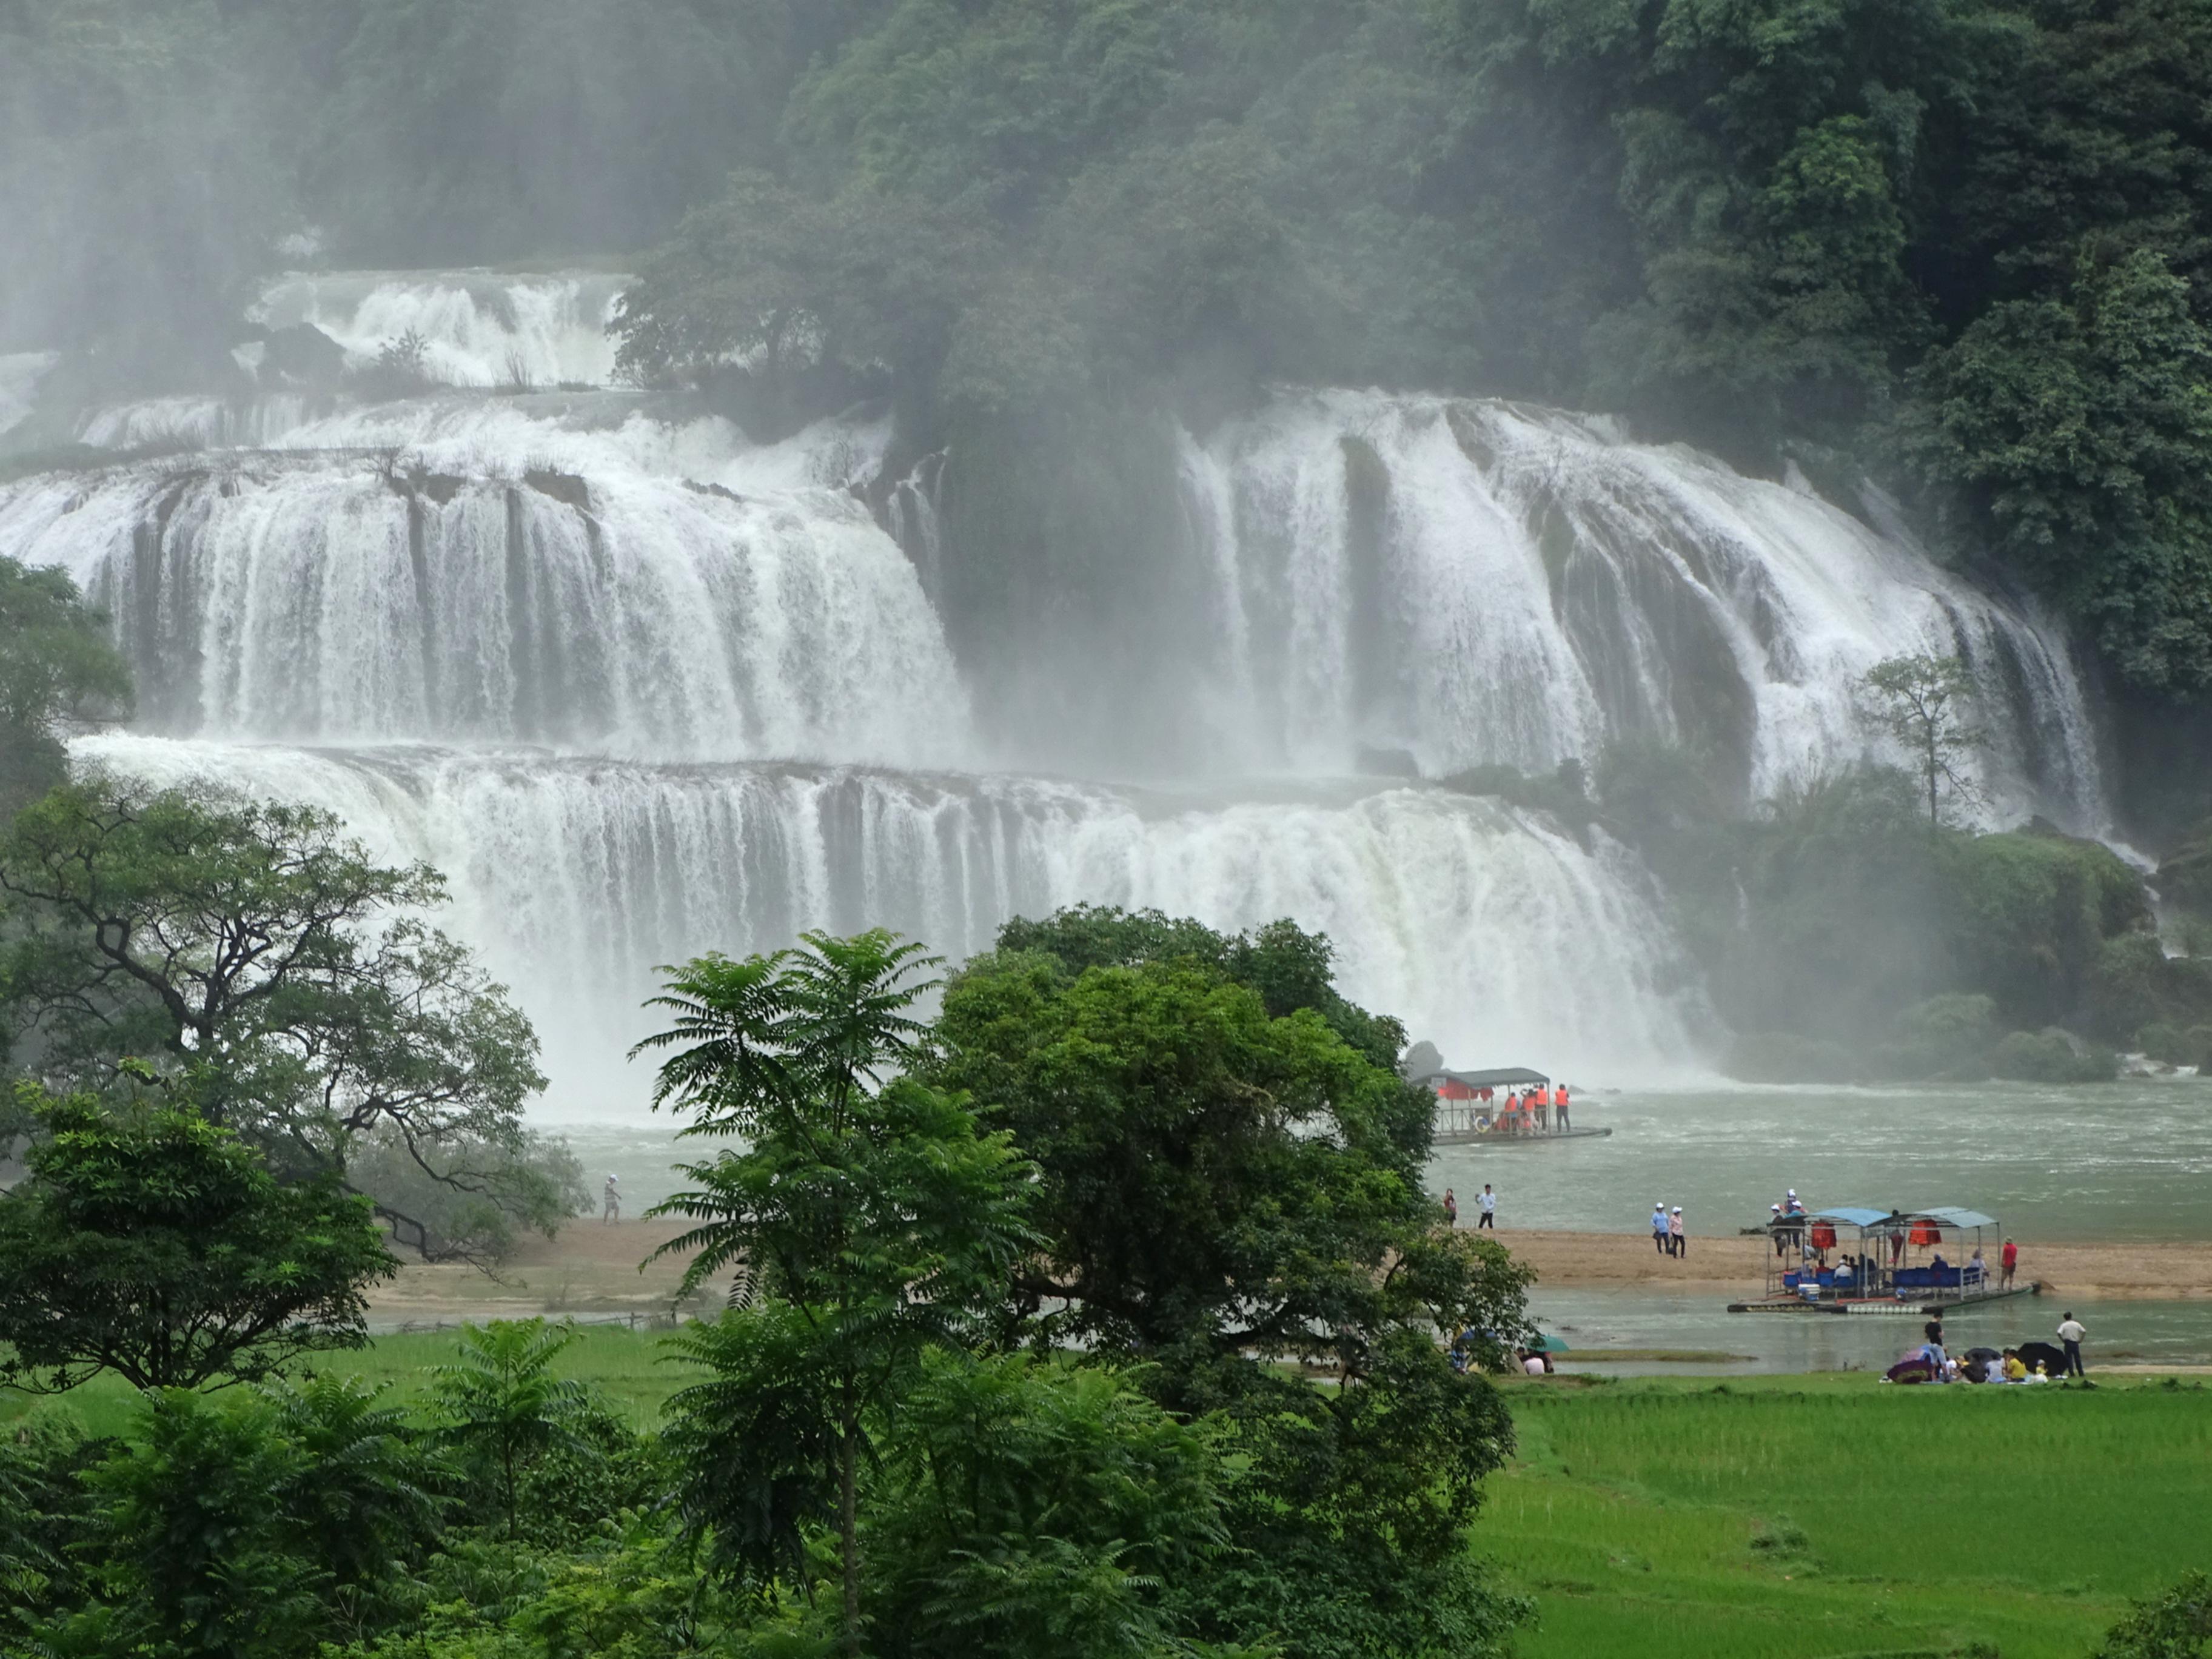 File Ban Gioc Waterfall Trung Kanh District Cao Bang Province Vietnam 02 48119872597 Jpg Wikimedia Commons